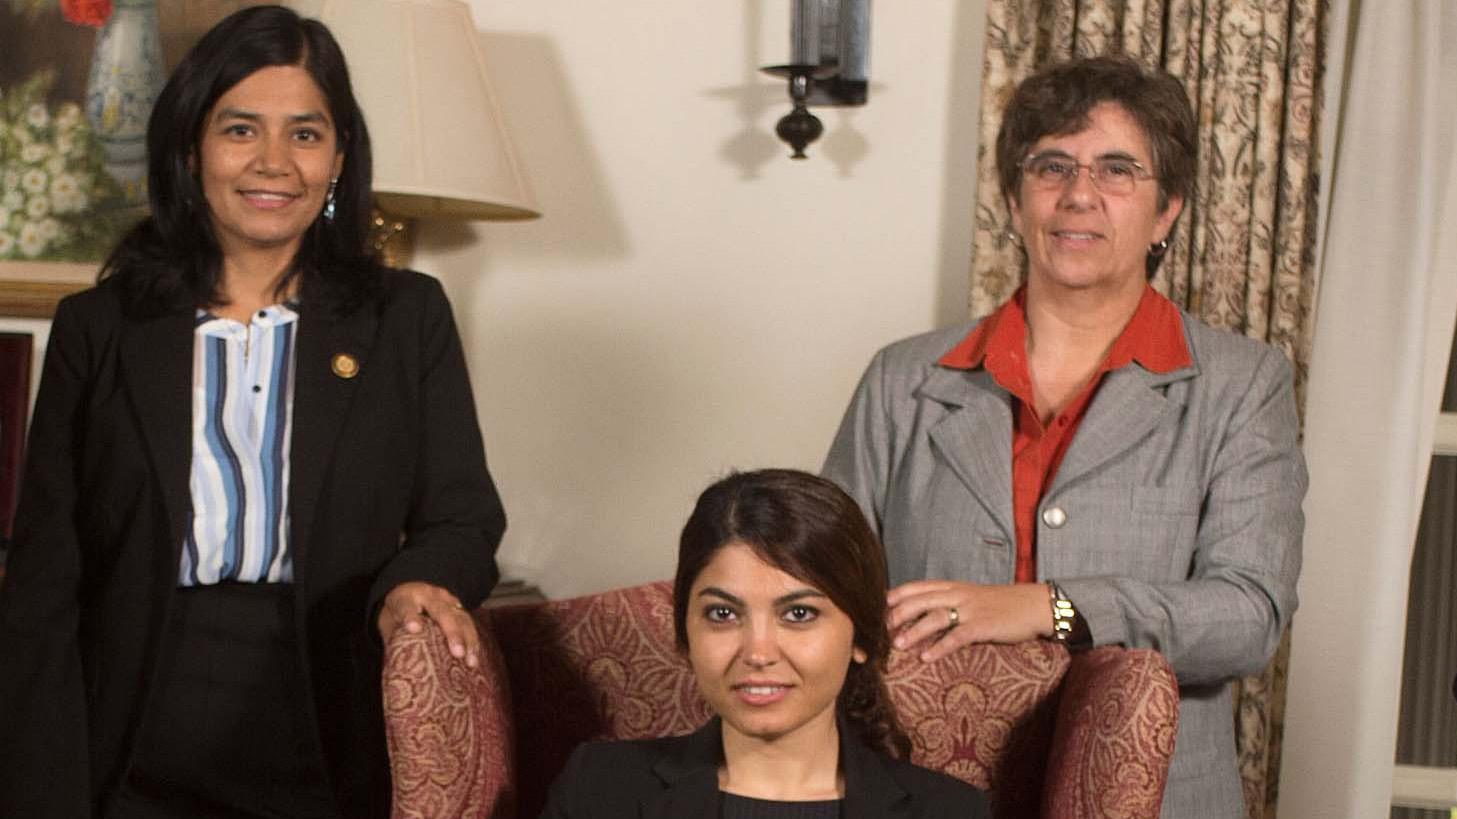 From left to right: Civil Engineering Professor Monica Palomo; Industrial & Manufacturing Engineering Professor Shokoufeh Mirzaei; and Civil Engineering Professor Francelina Neto.